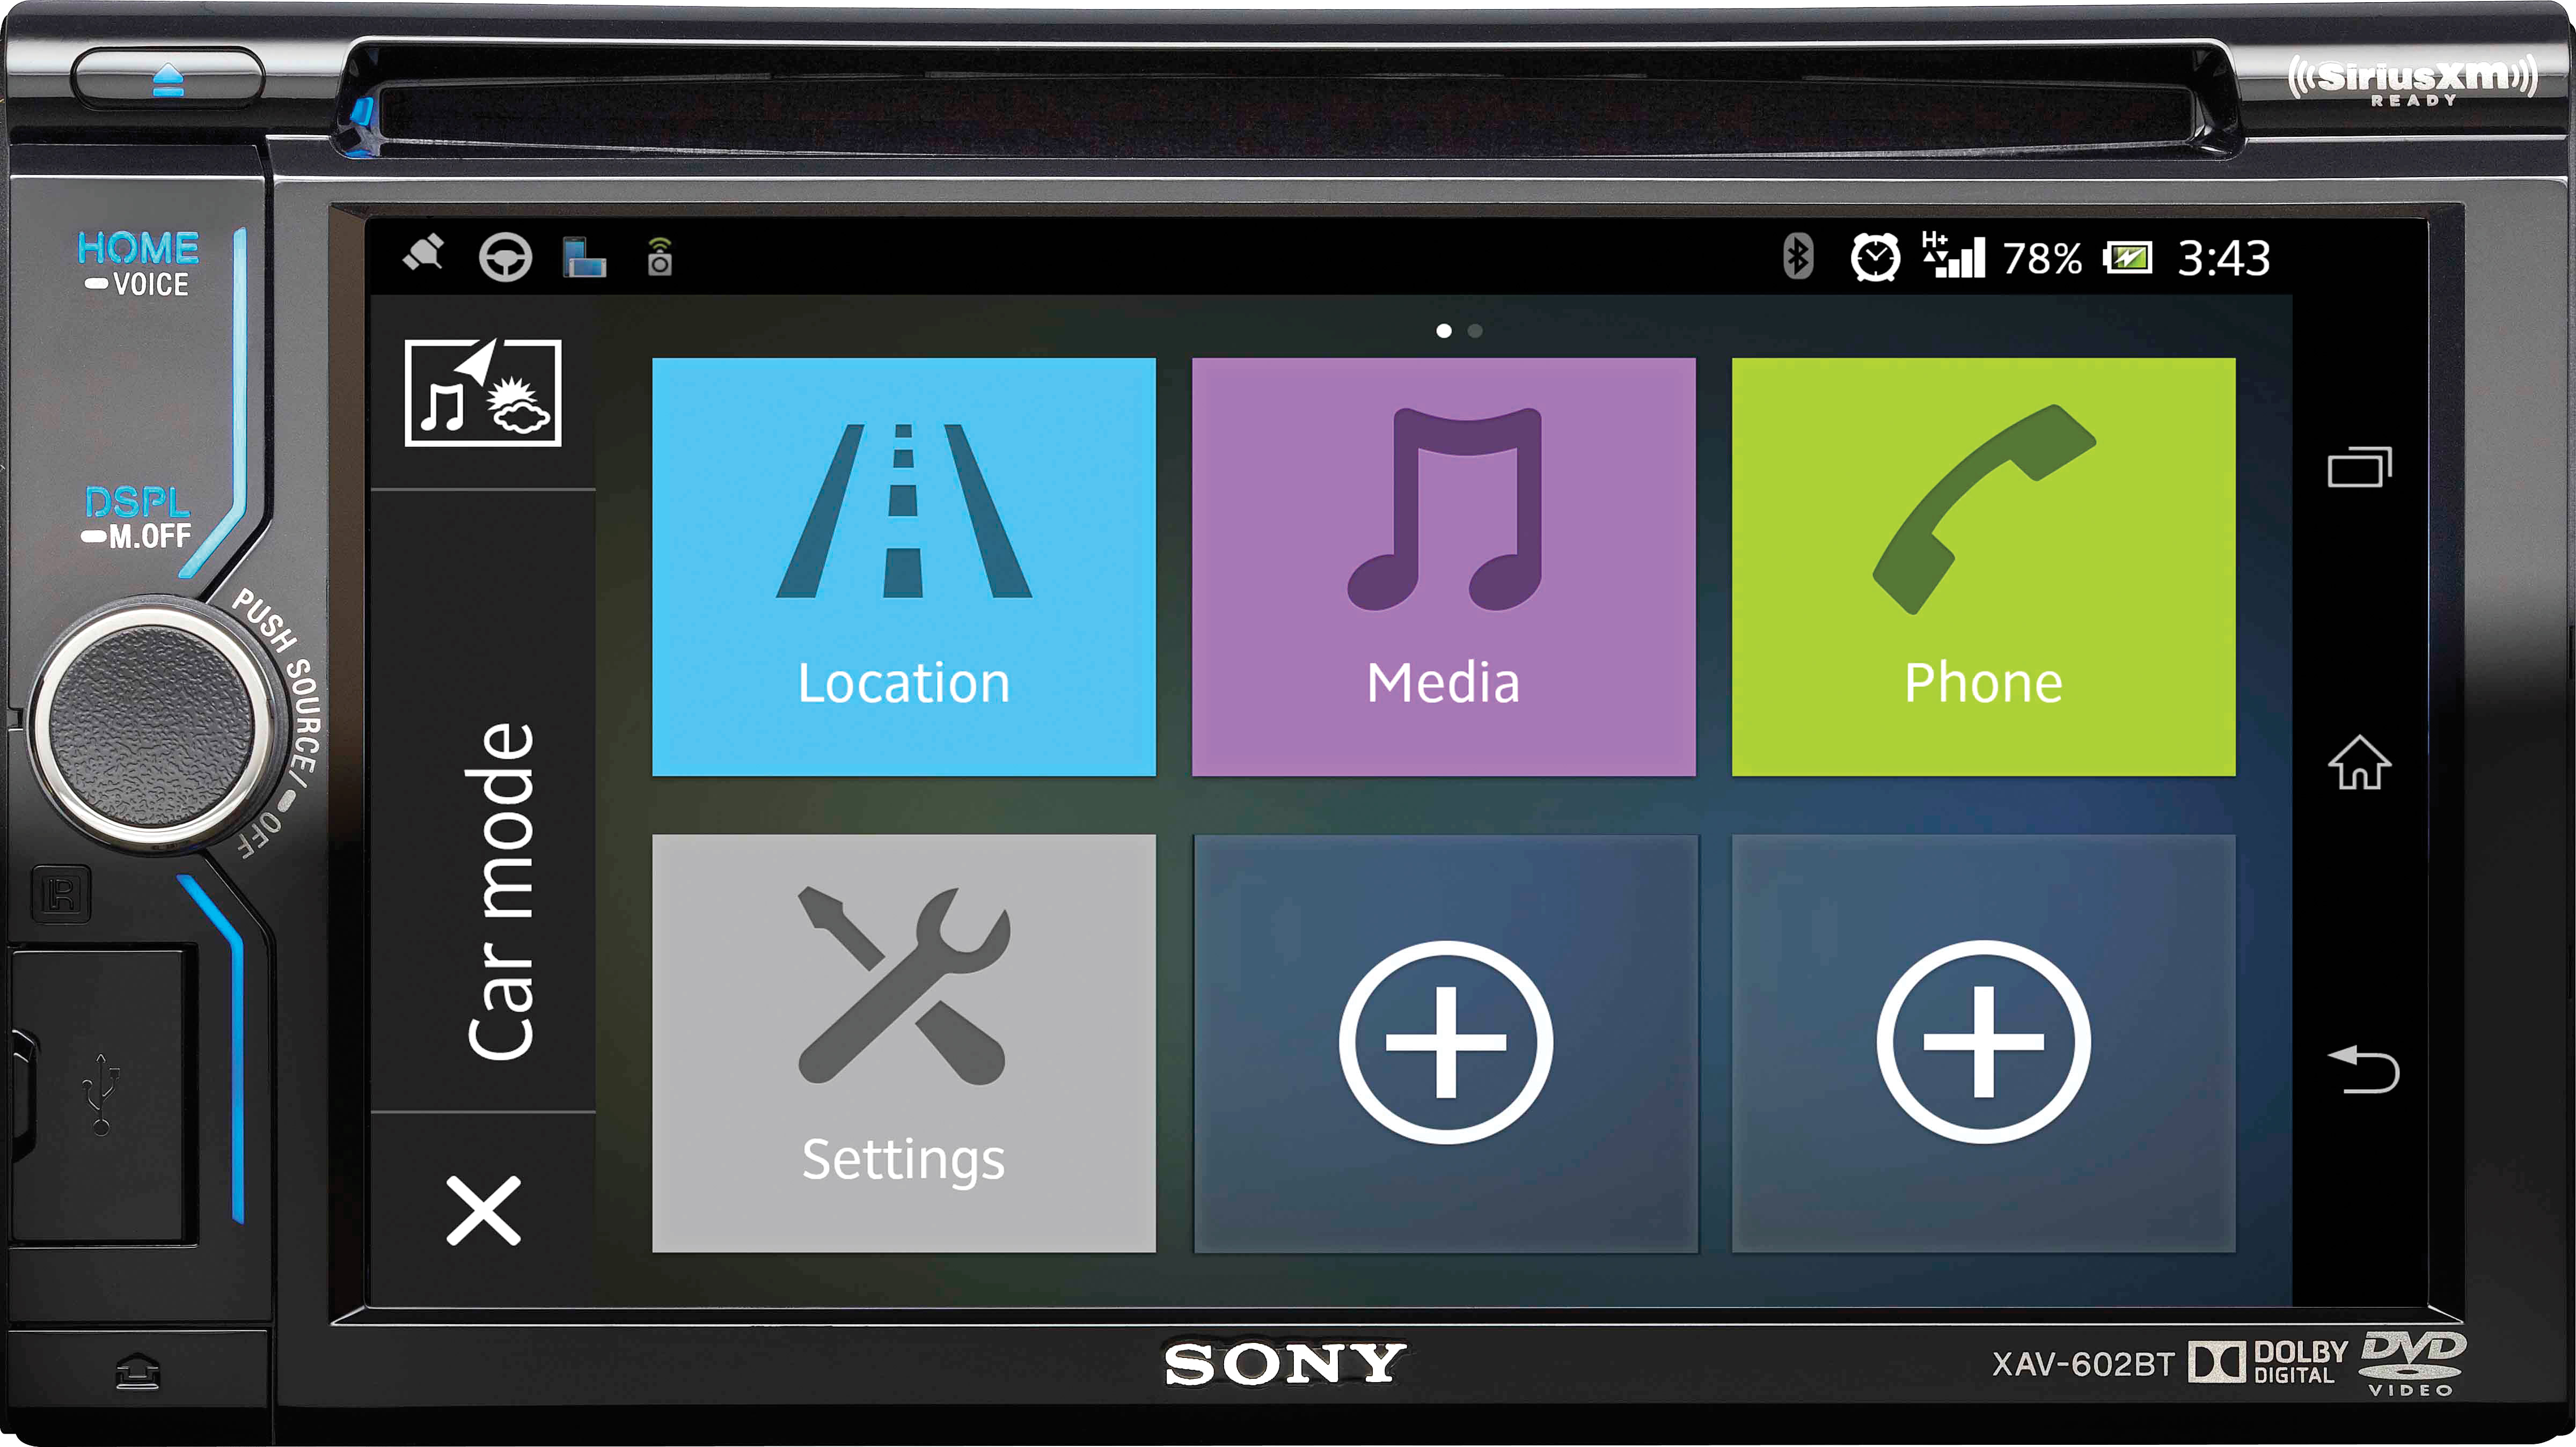 PASMAG | PERFORMANCE AUTO AND SOUND - SONY XAV-602BT Multimedia ...